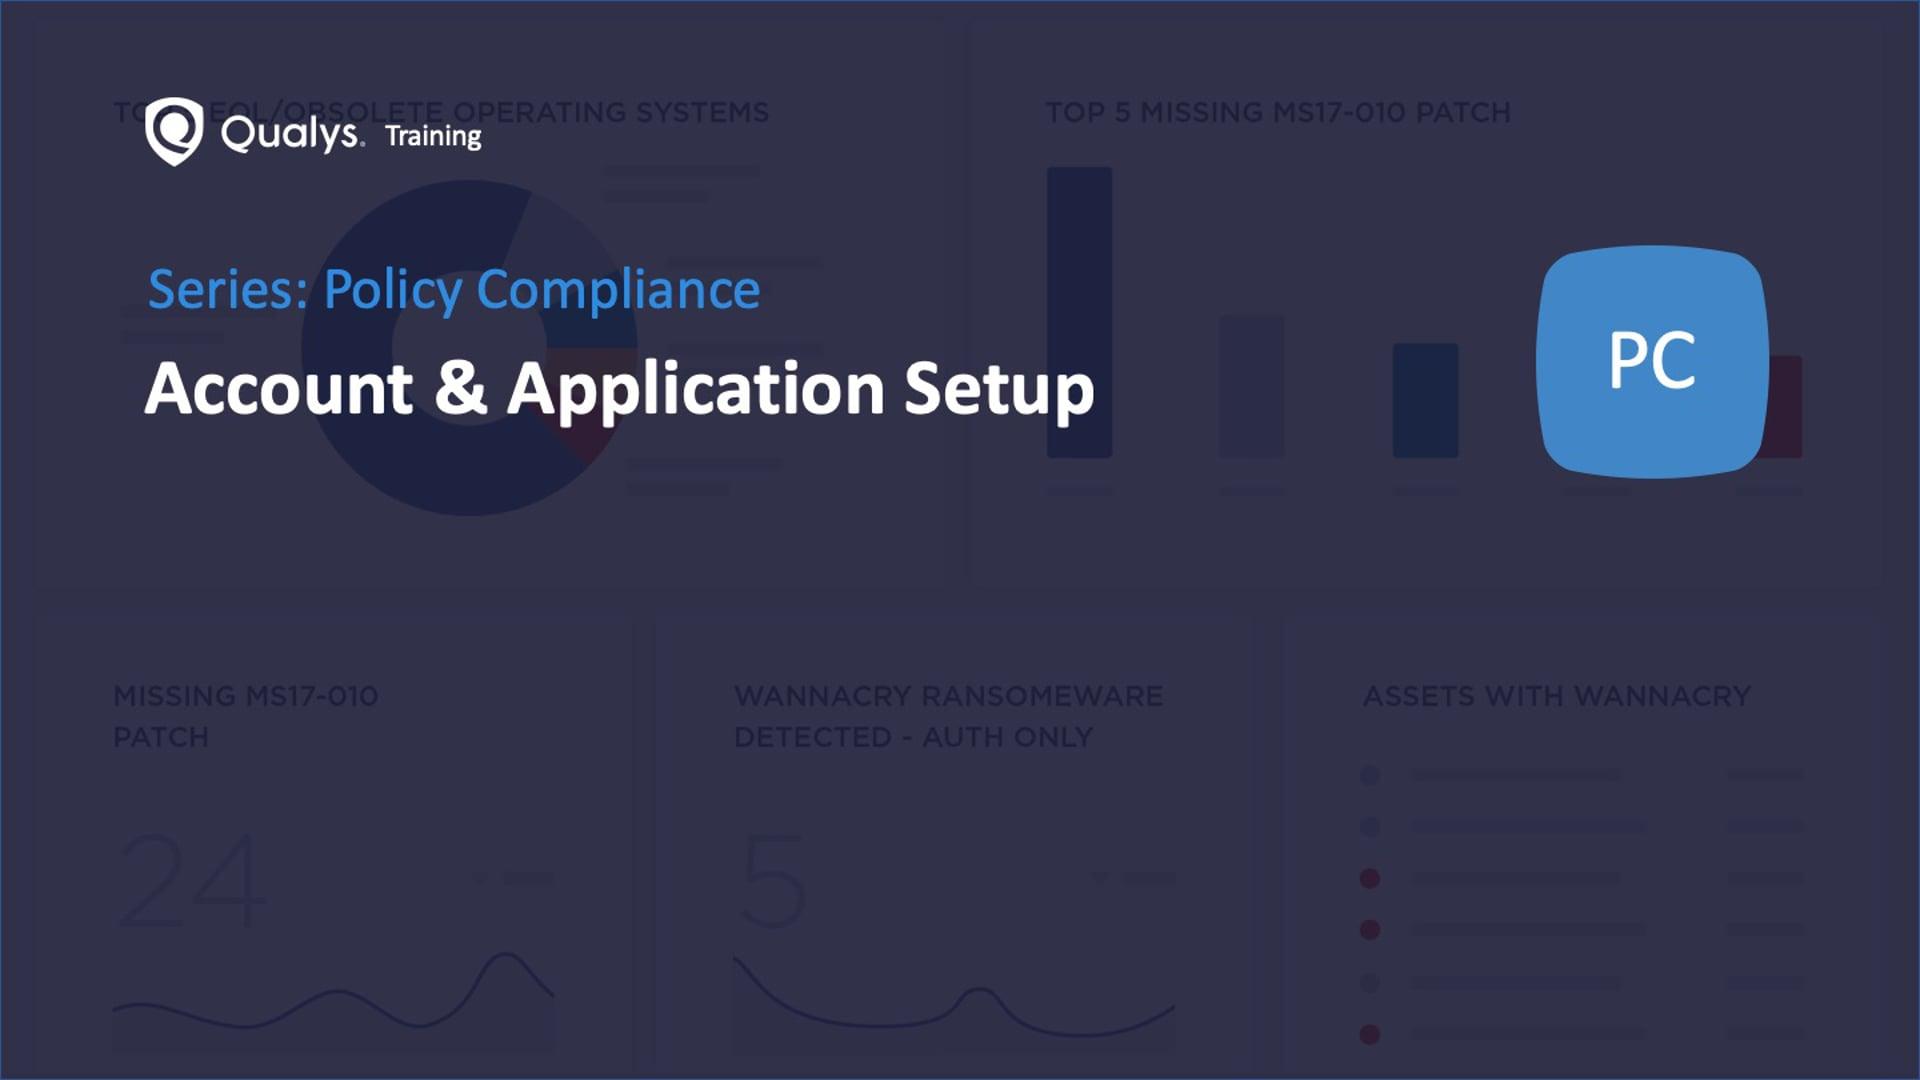 Account & Application Setup